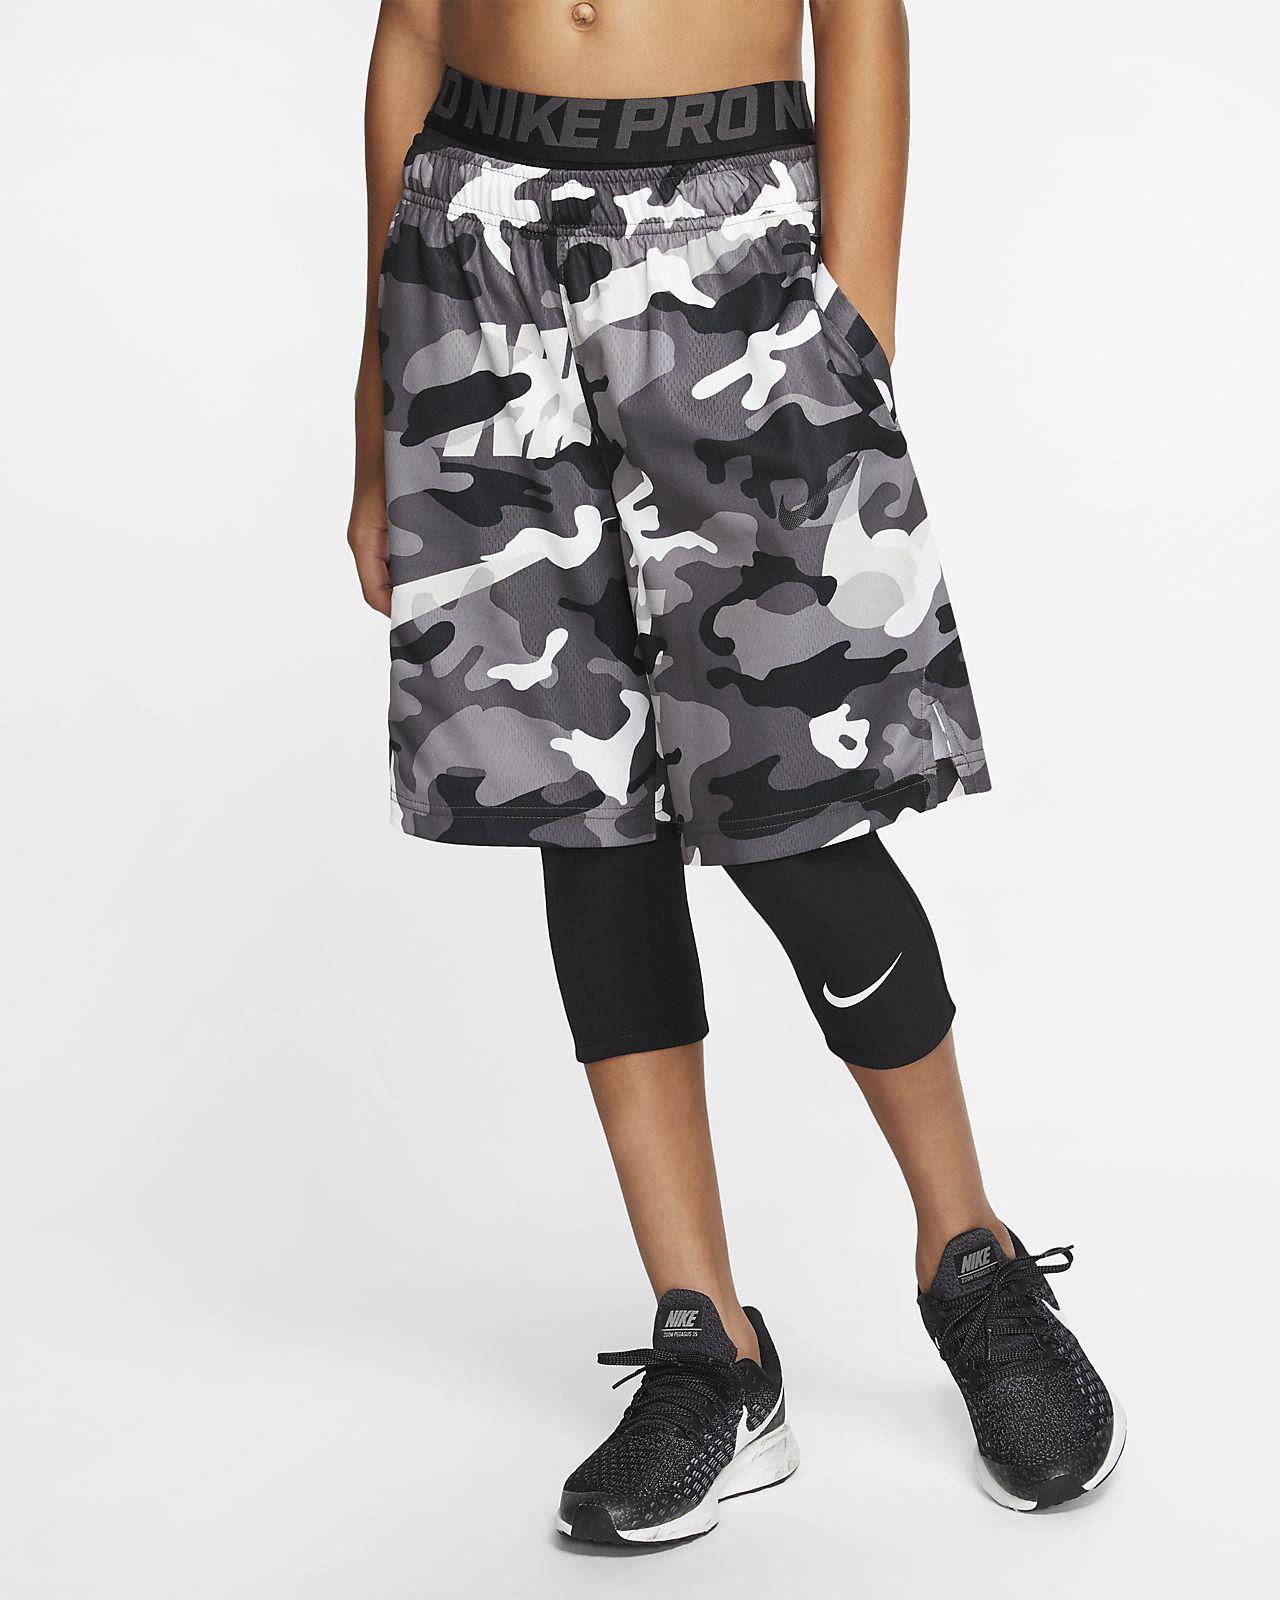 Nike Pro Big Kids' (Boys') 3/4-Length Tights